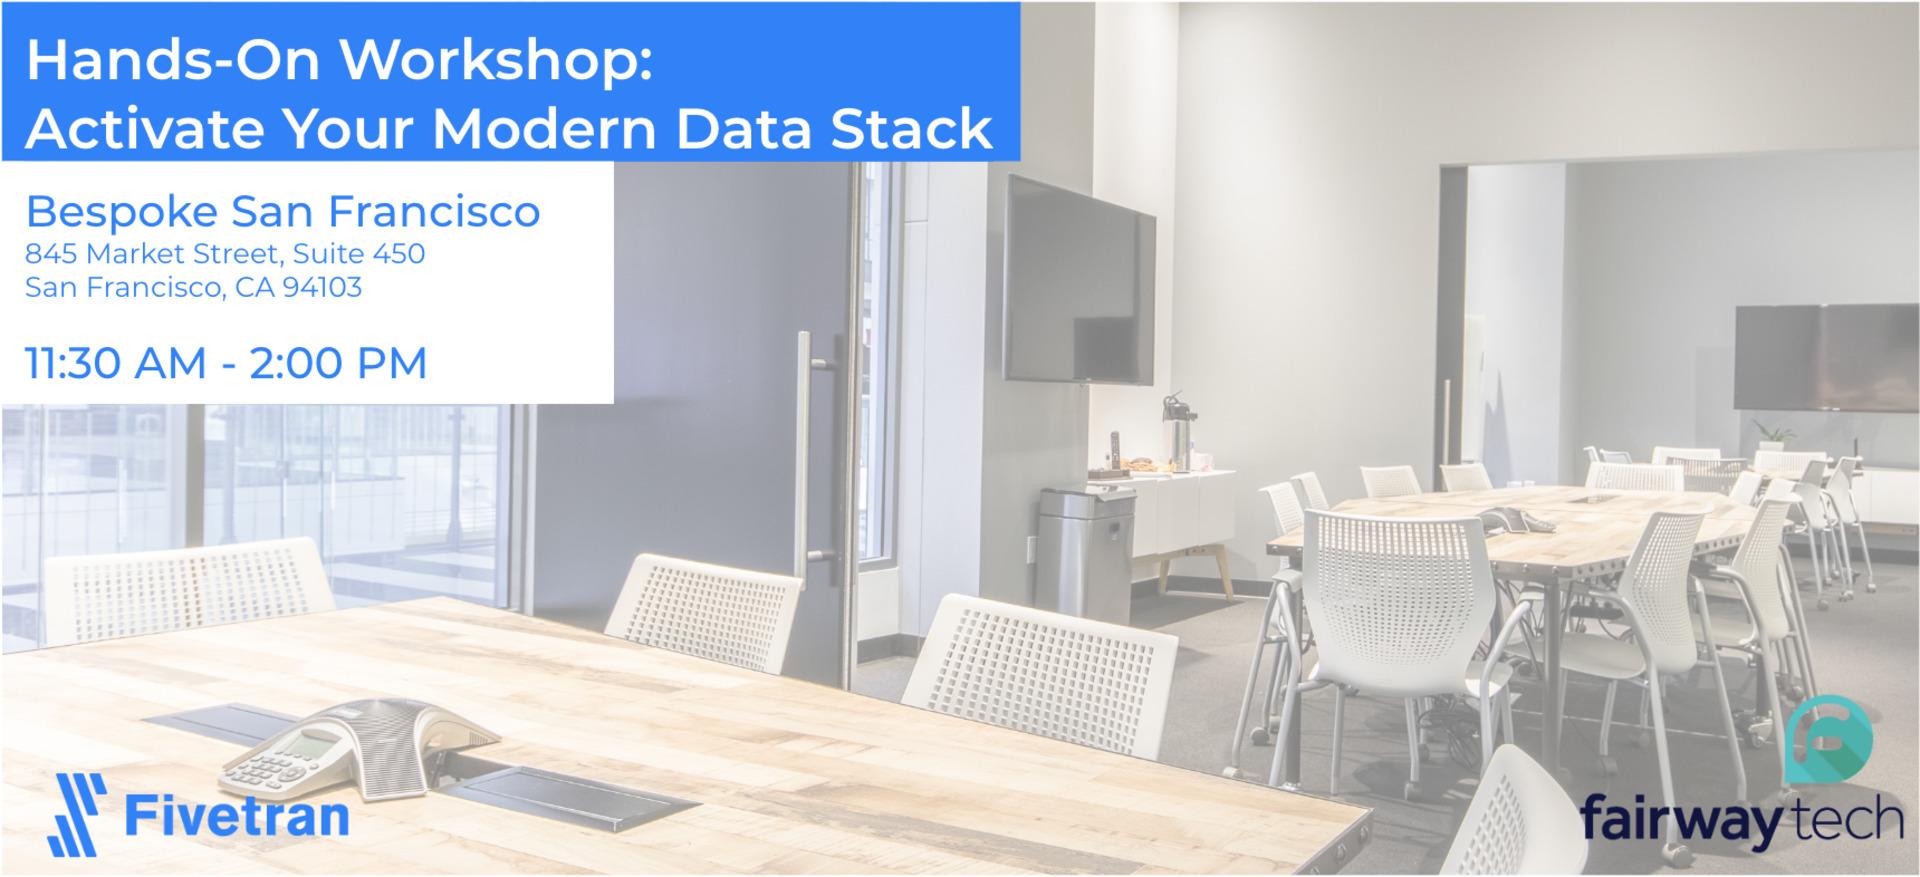 Hands-On Workshop - Activate your Modern Data Stack - San Francisco